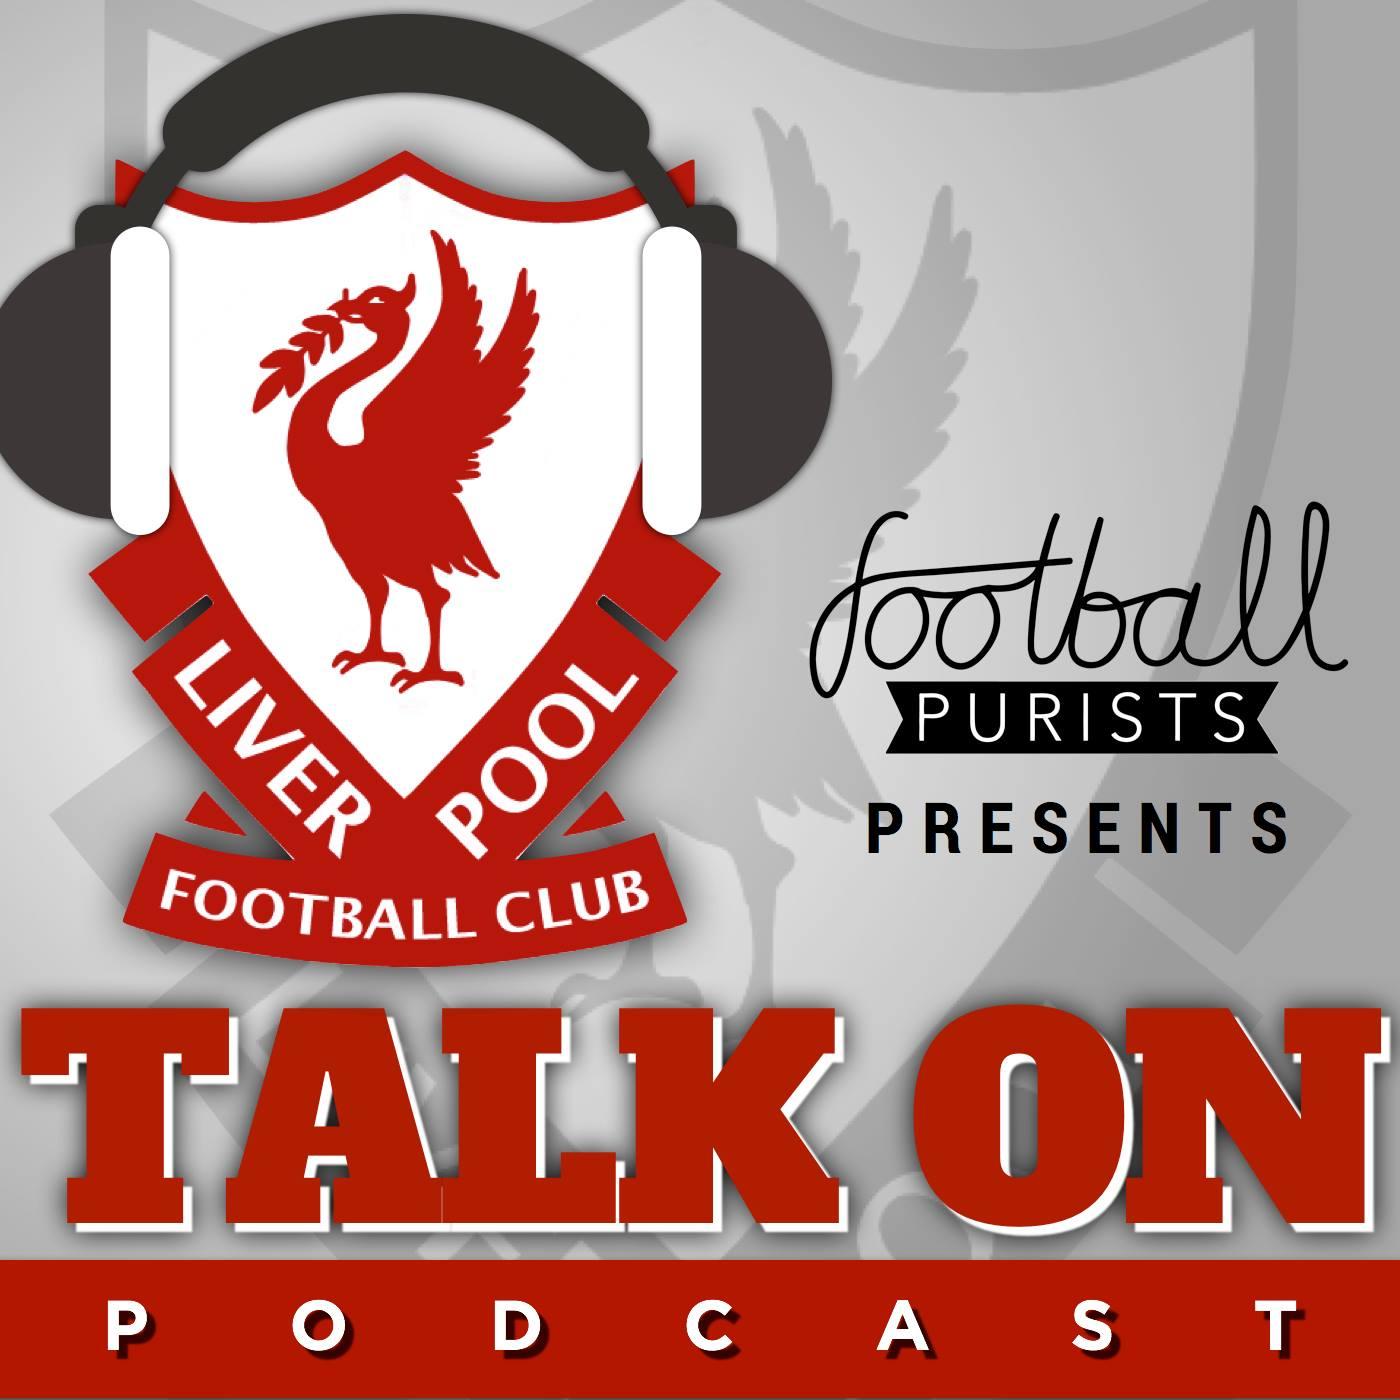 Liverpool: Talk On: Tis The Season